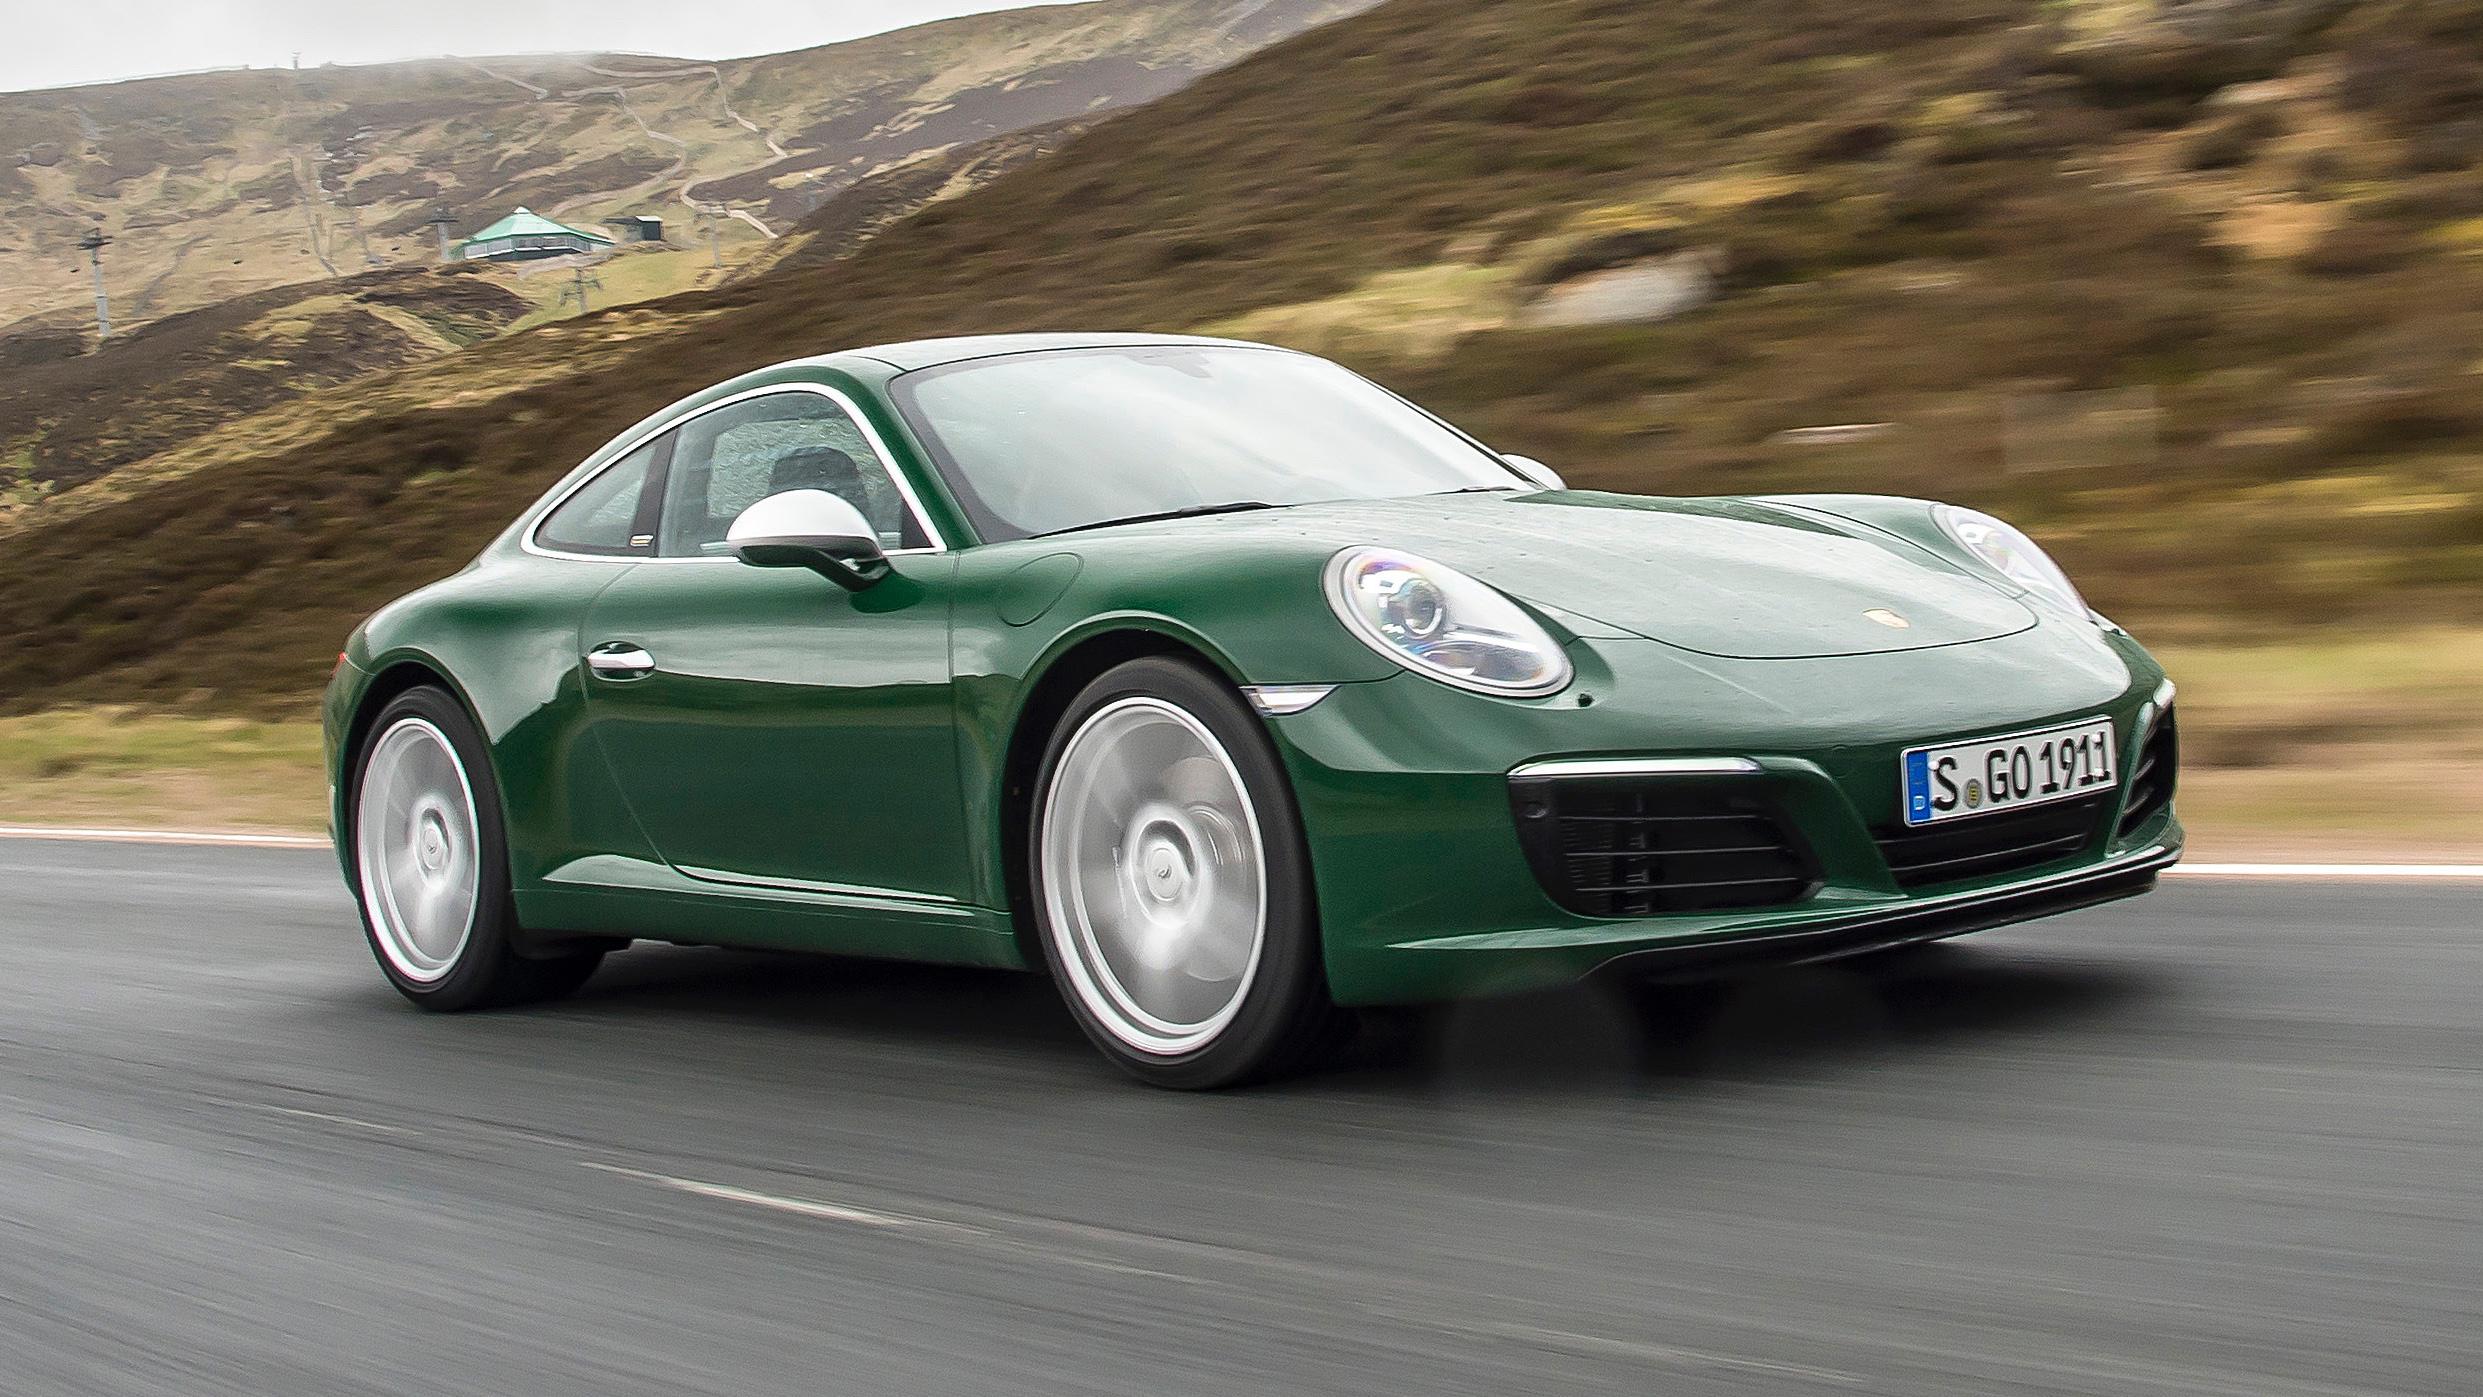 Porsche 718 Cayman S >> The one millionth Porsche 911 is superb | Top Gear